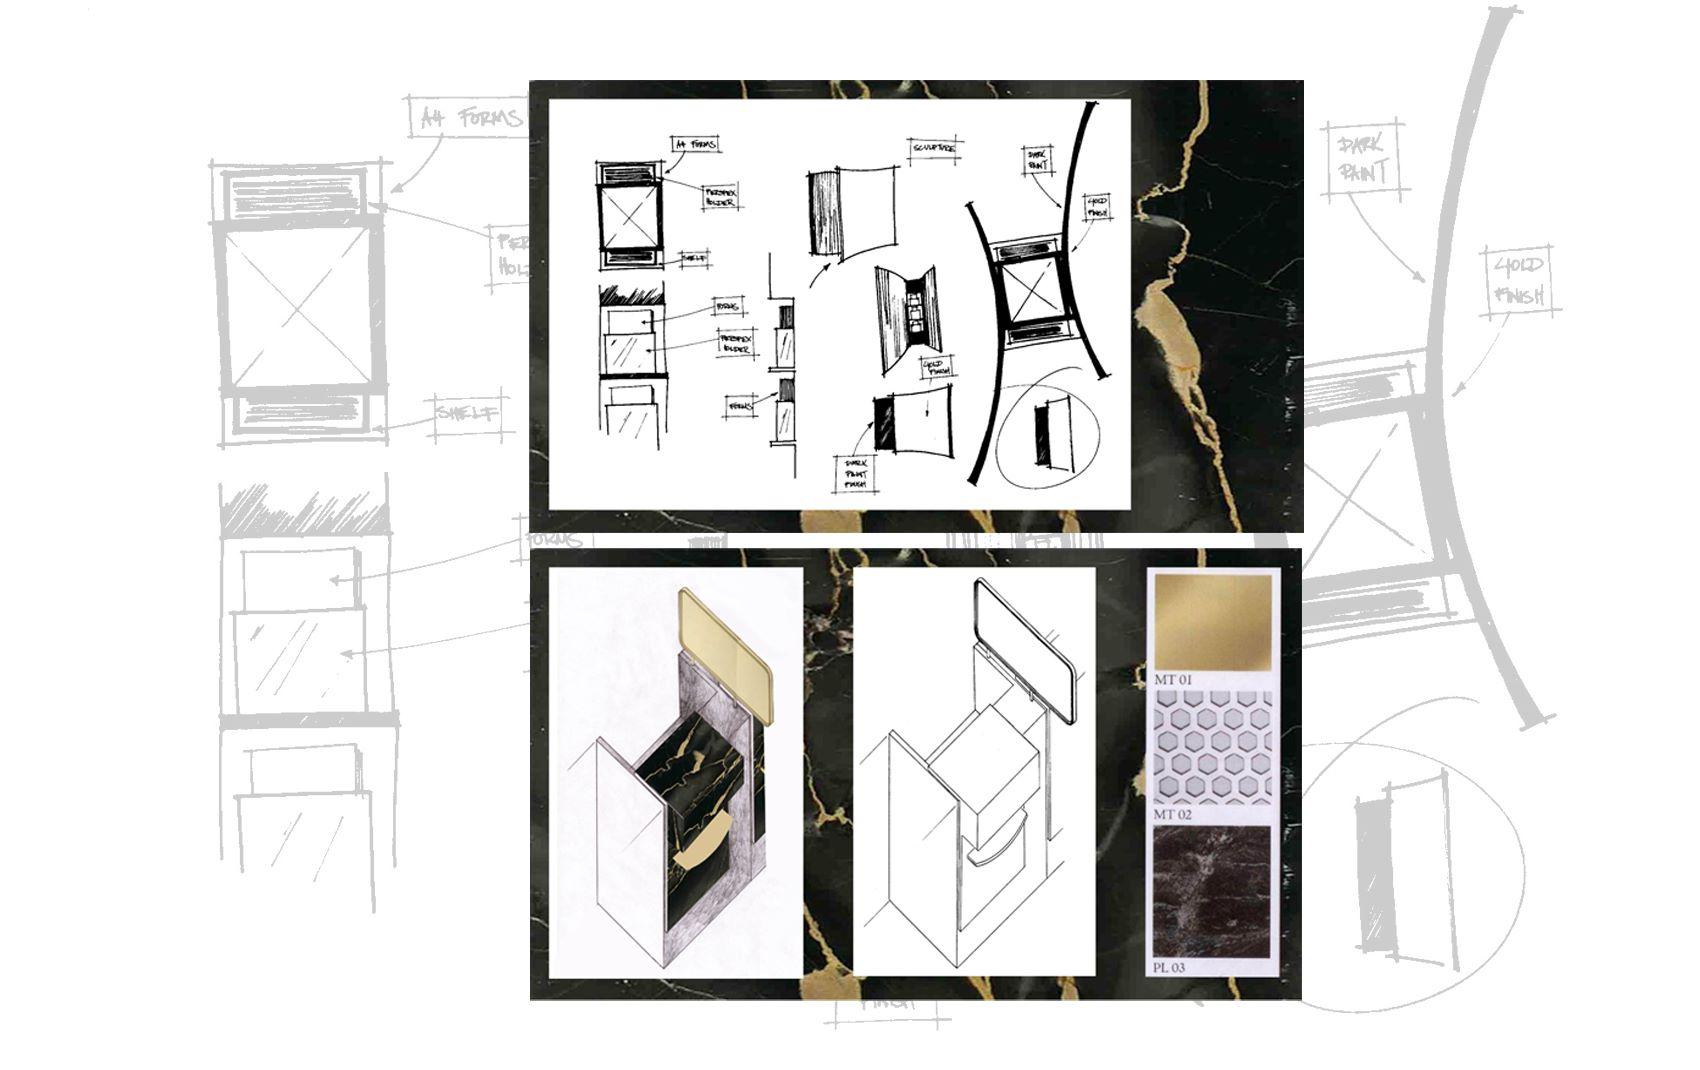 international visa centres - luxury interior architecture